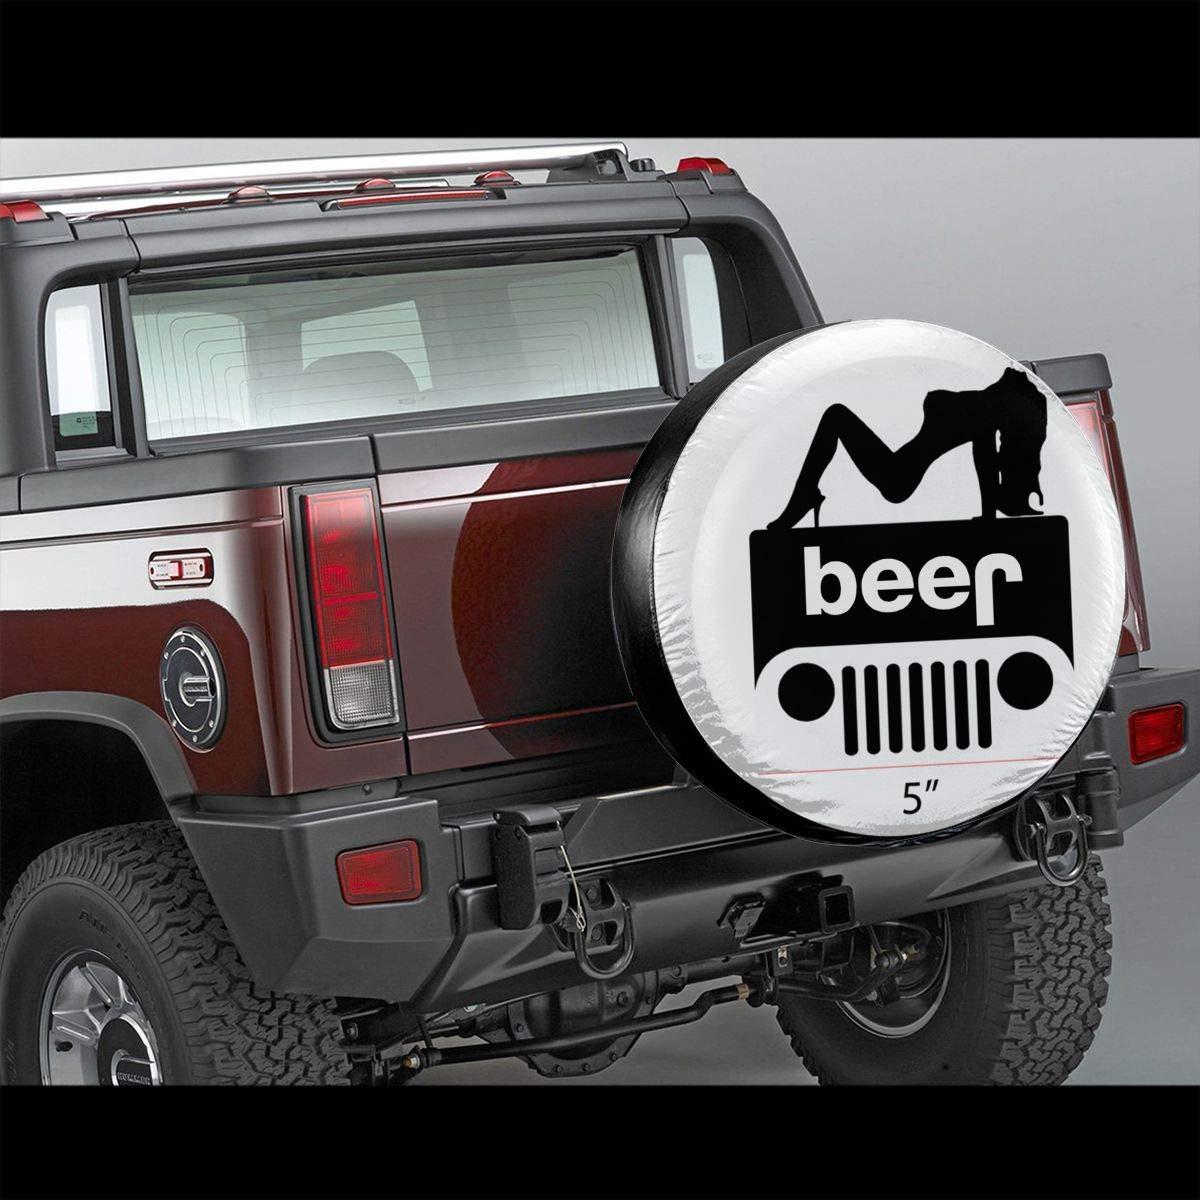 Spare Wheel Covers WBinHua Couvre-Roue de Secours Jeep-Wrangler Logo 4X4 Spare Wheel Tire Cover Vinyl Cover with Elastic Hem-Durable Design Keeps Dirt